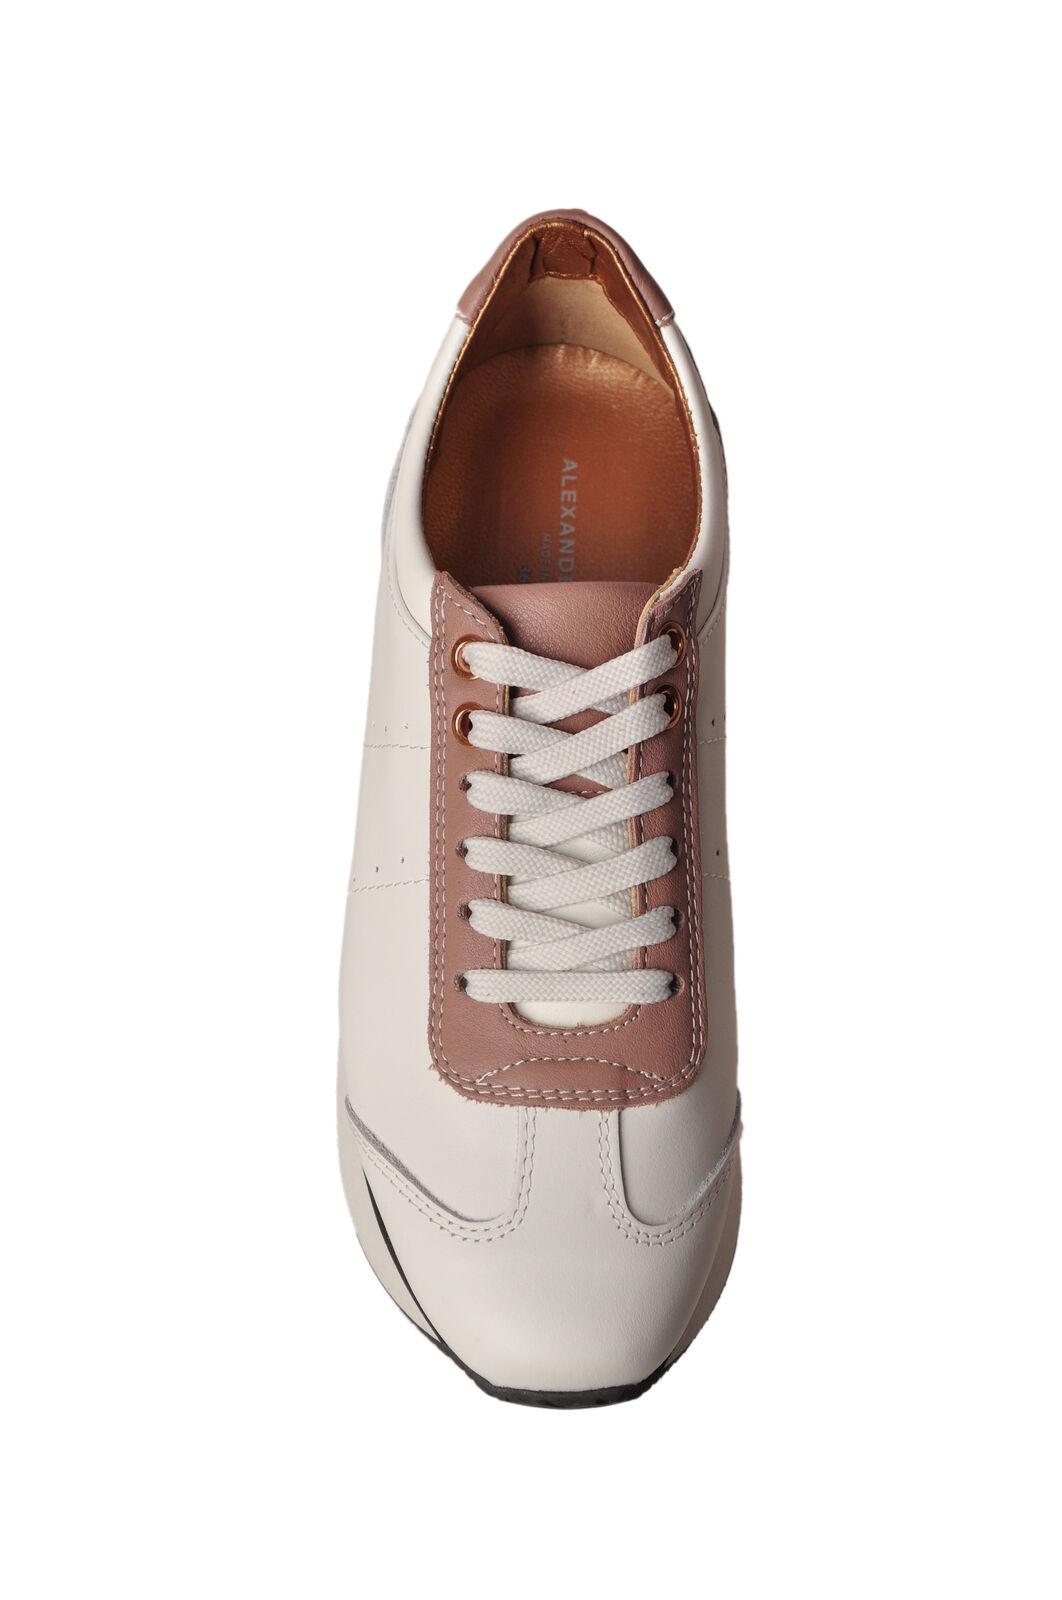 Alexander Alexander Alexander Smith - chaussures-baskets low - Woman - blanc - 5031206E184051 76f4e8